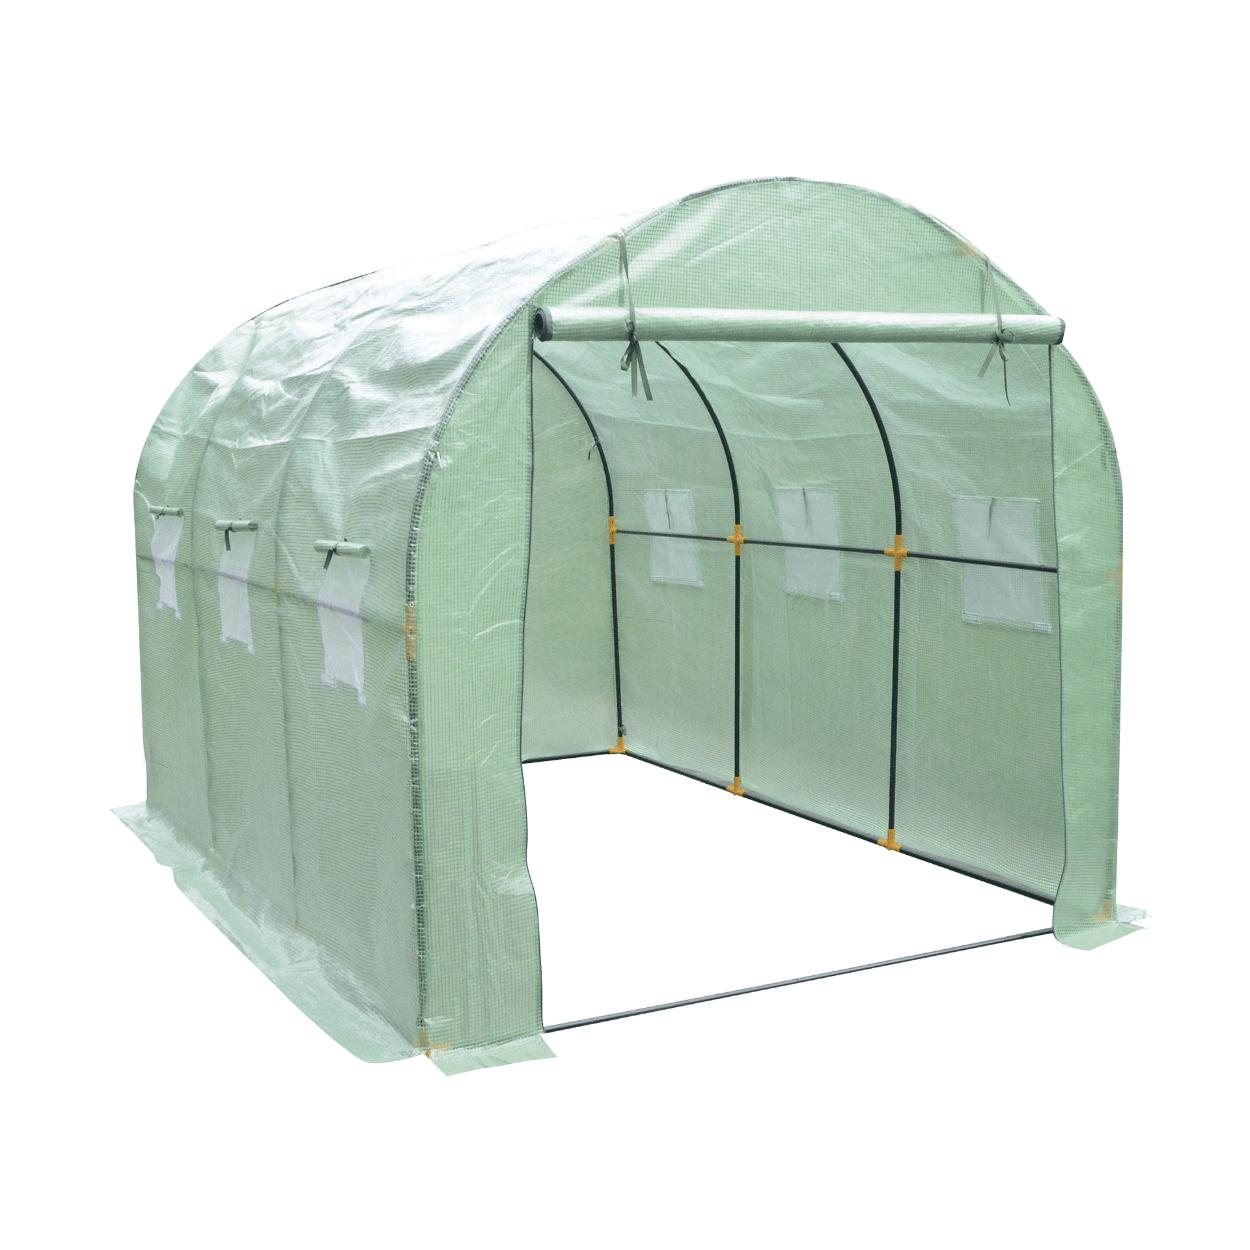 Grande serre de jardin tunnel Gardenline